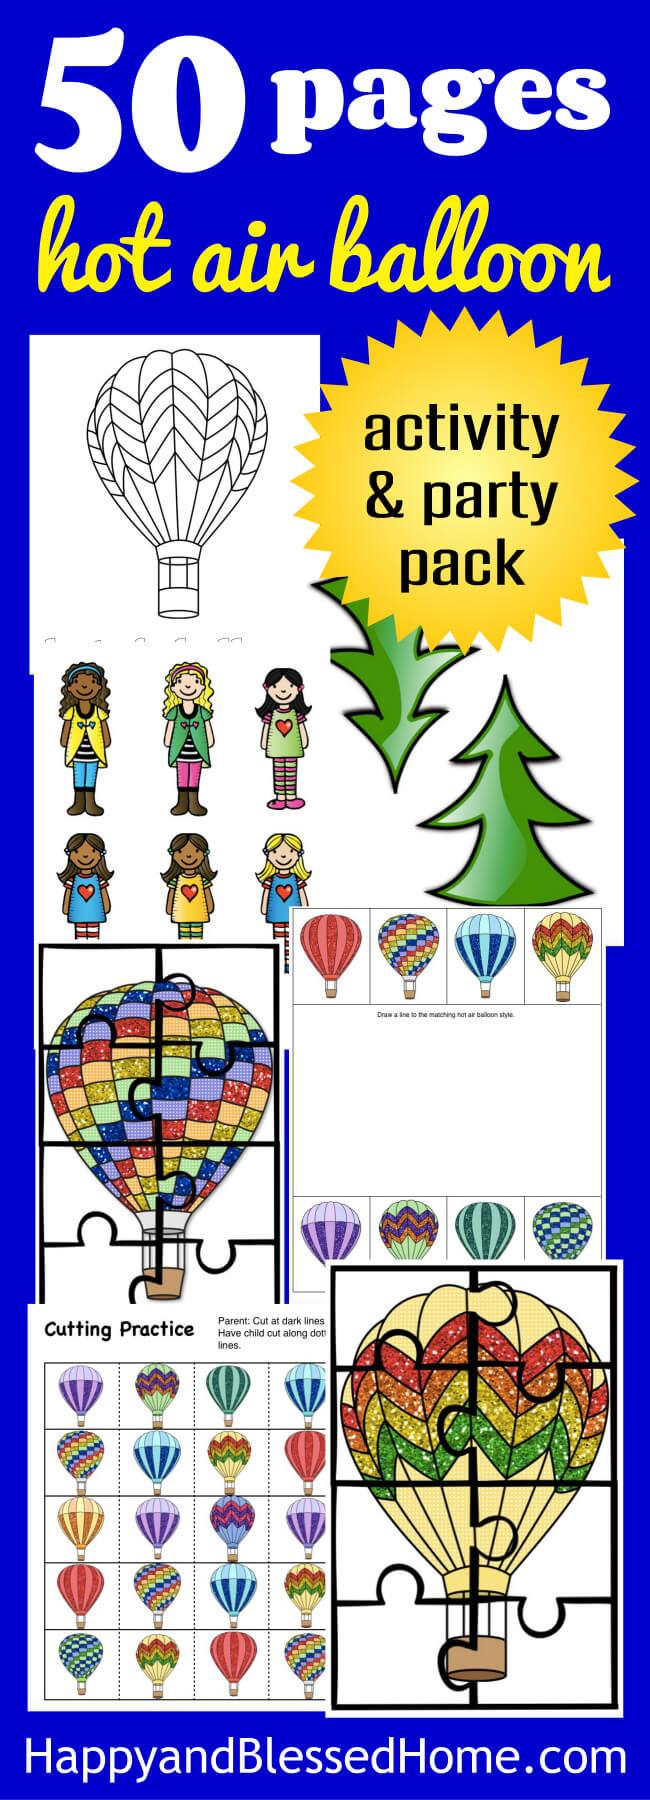 medium resolution of Hot Air Balloon Activity Pack for Kids and Fun Hot Air Balloon Recipe